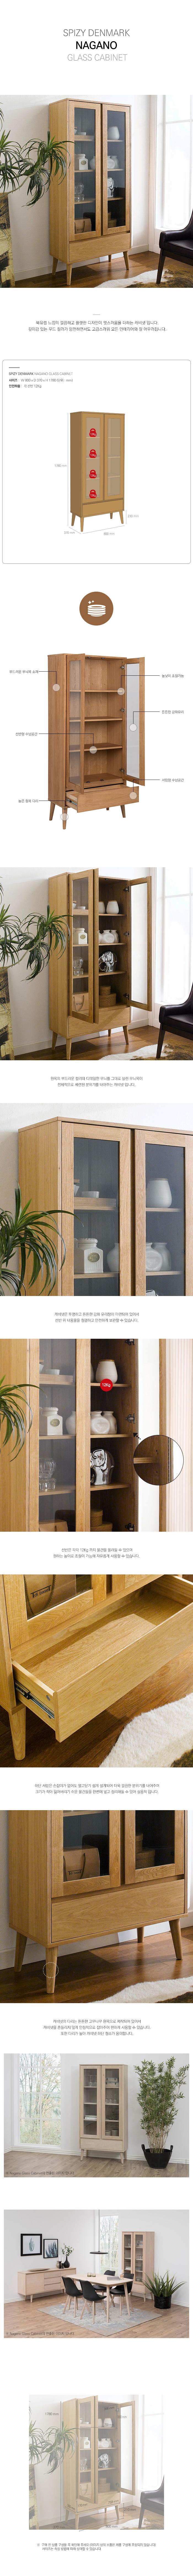 5_11_Nagano_Glass_Cabinet.jpg